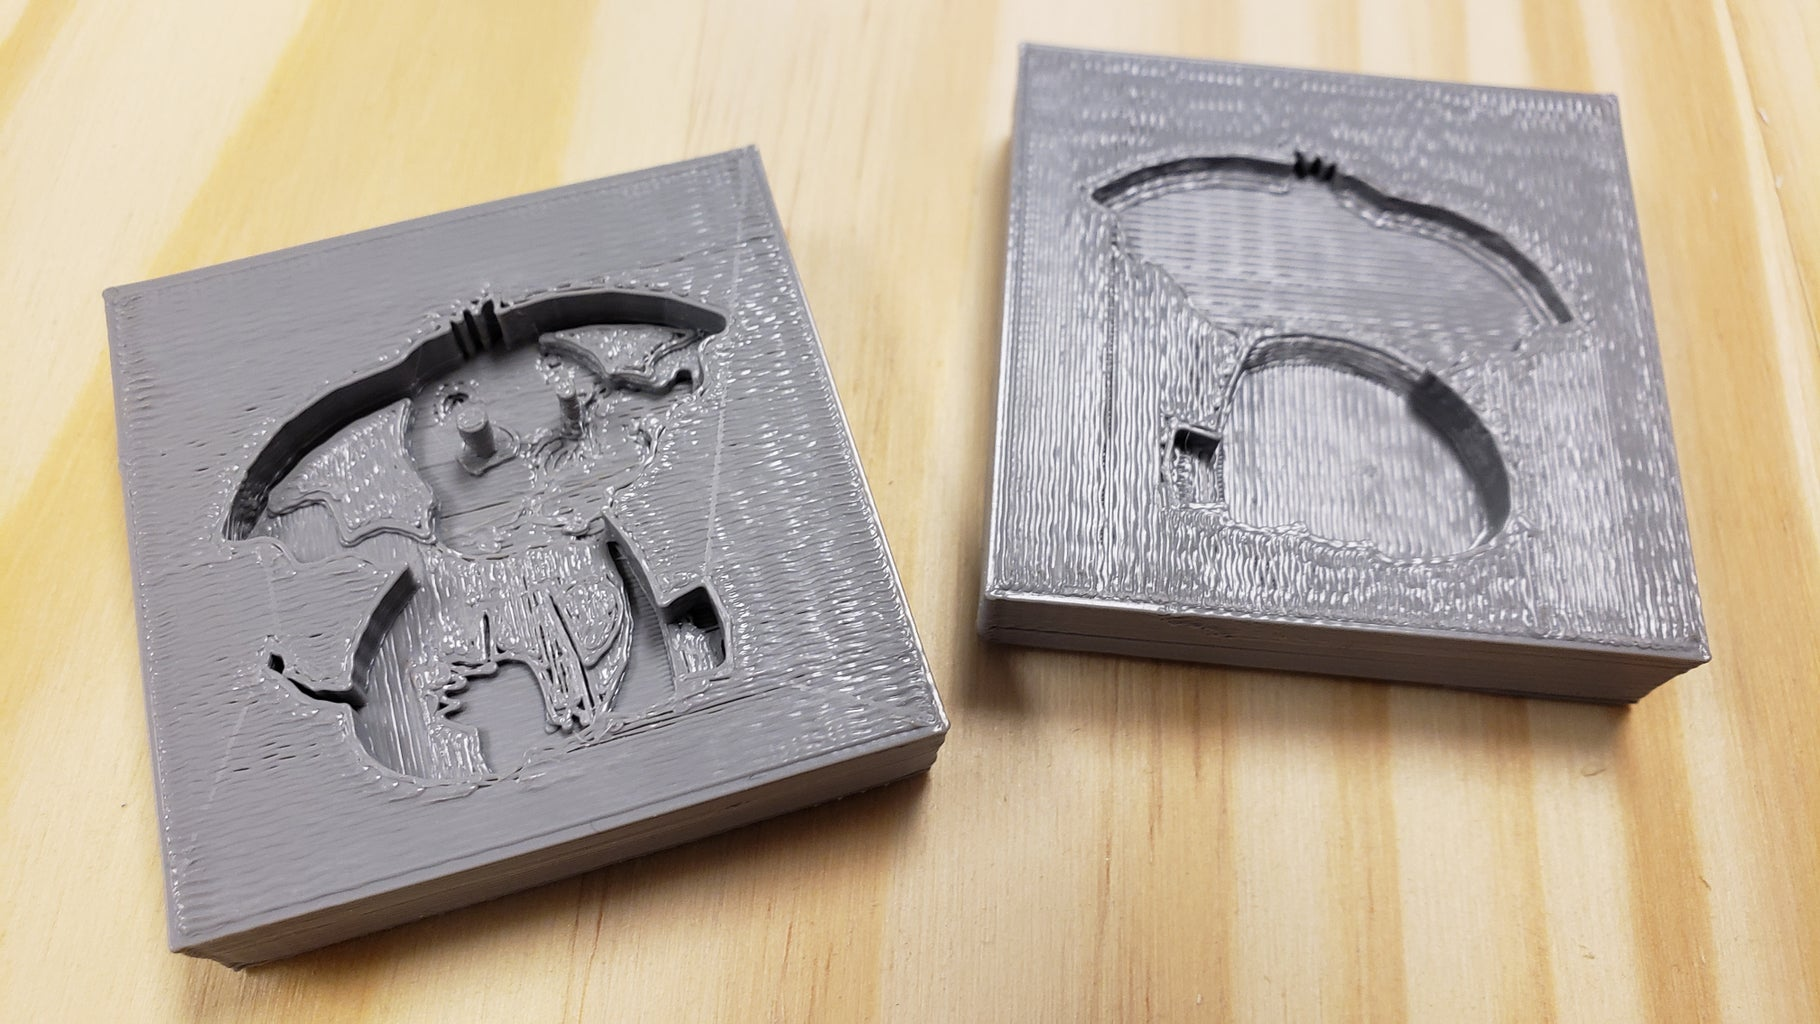 3D Print the Molds